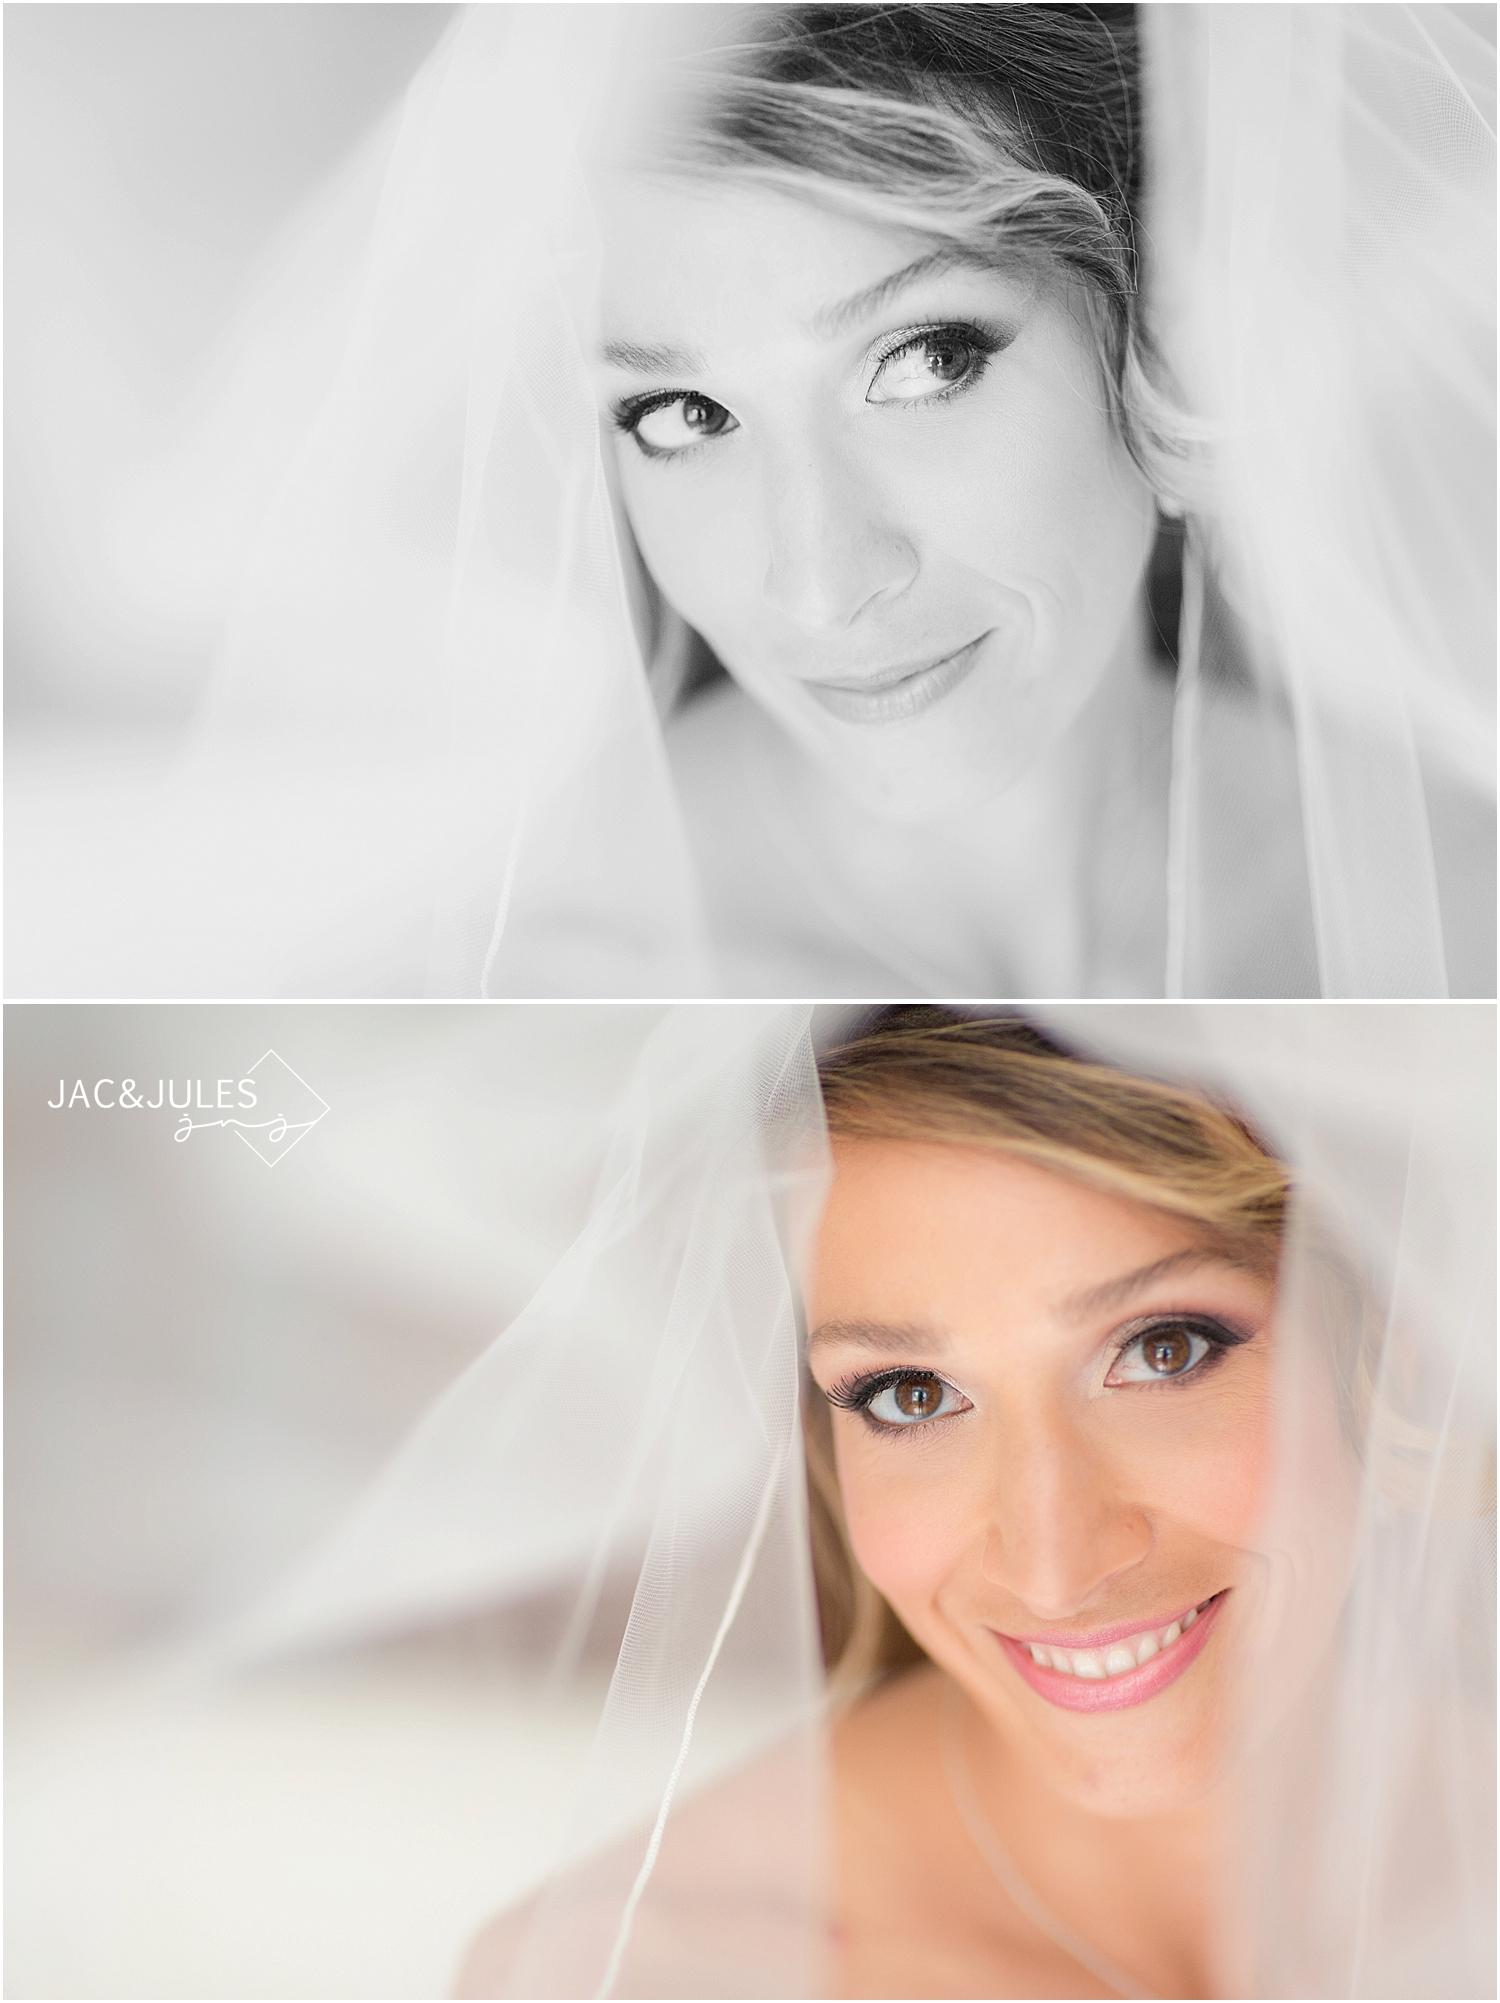 jacnjules photographs beautiful bride in lebanon nj